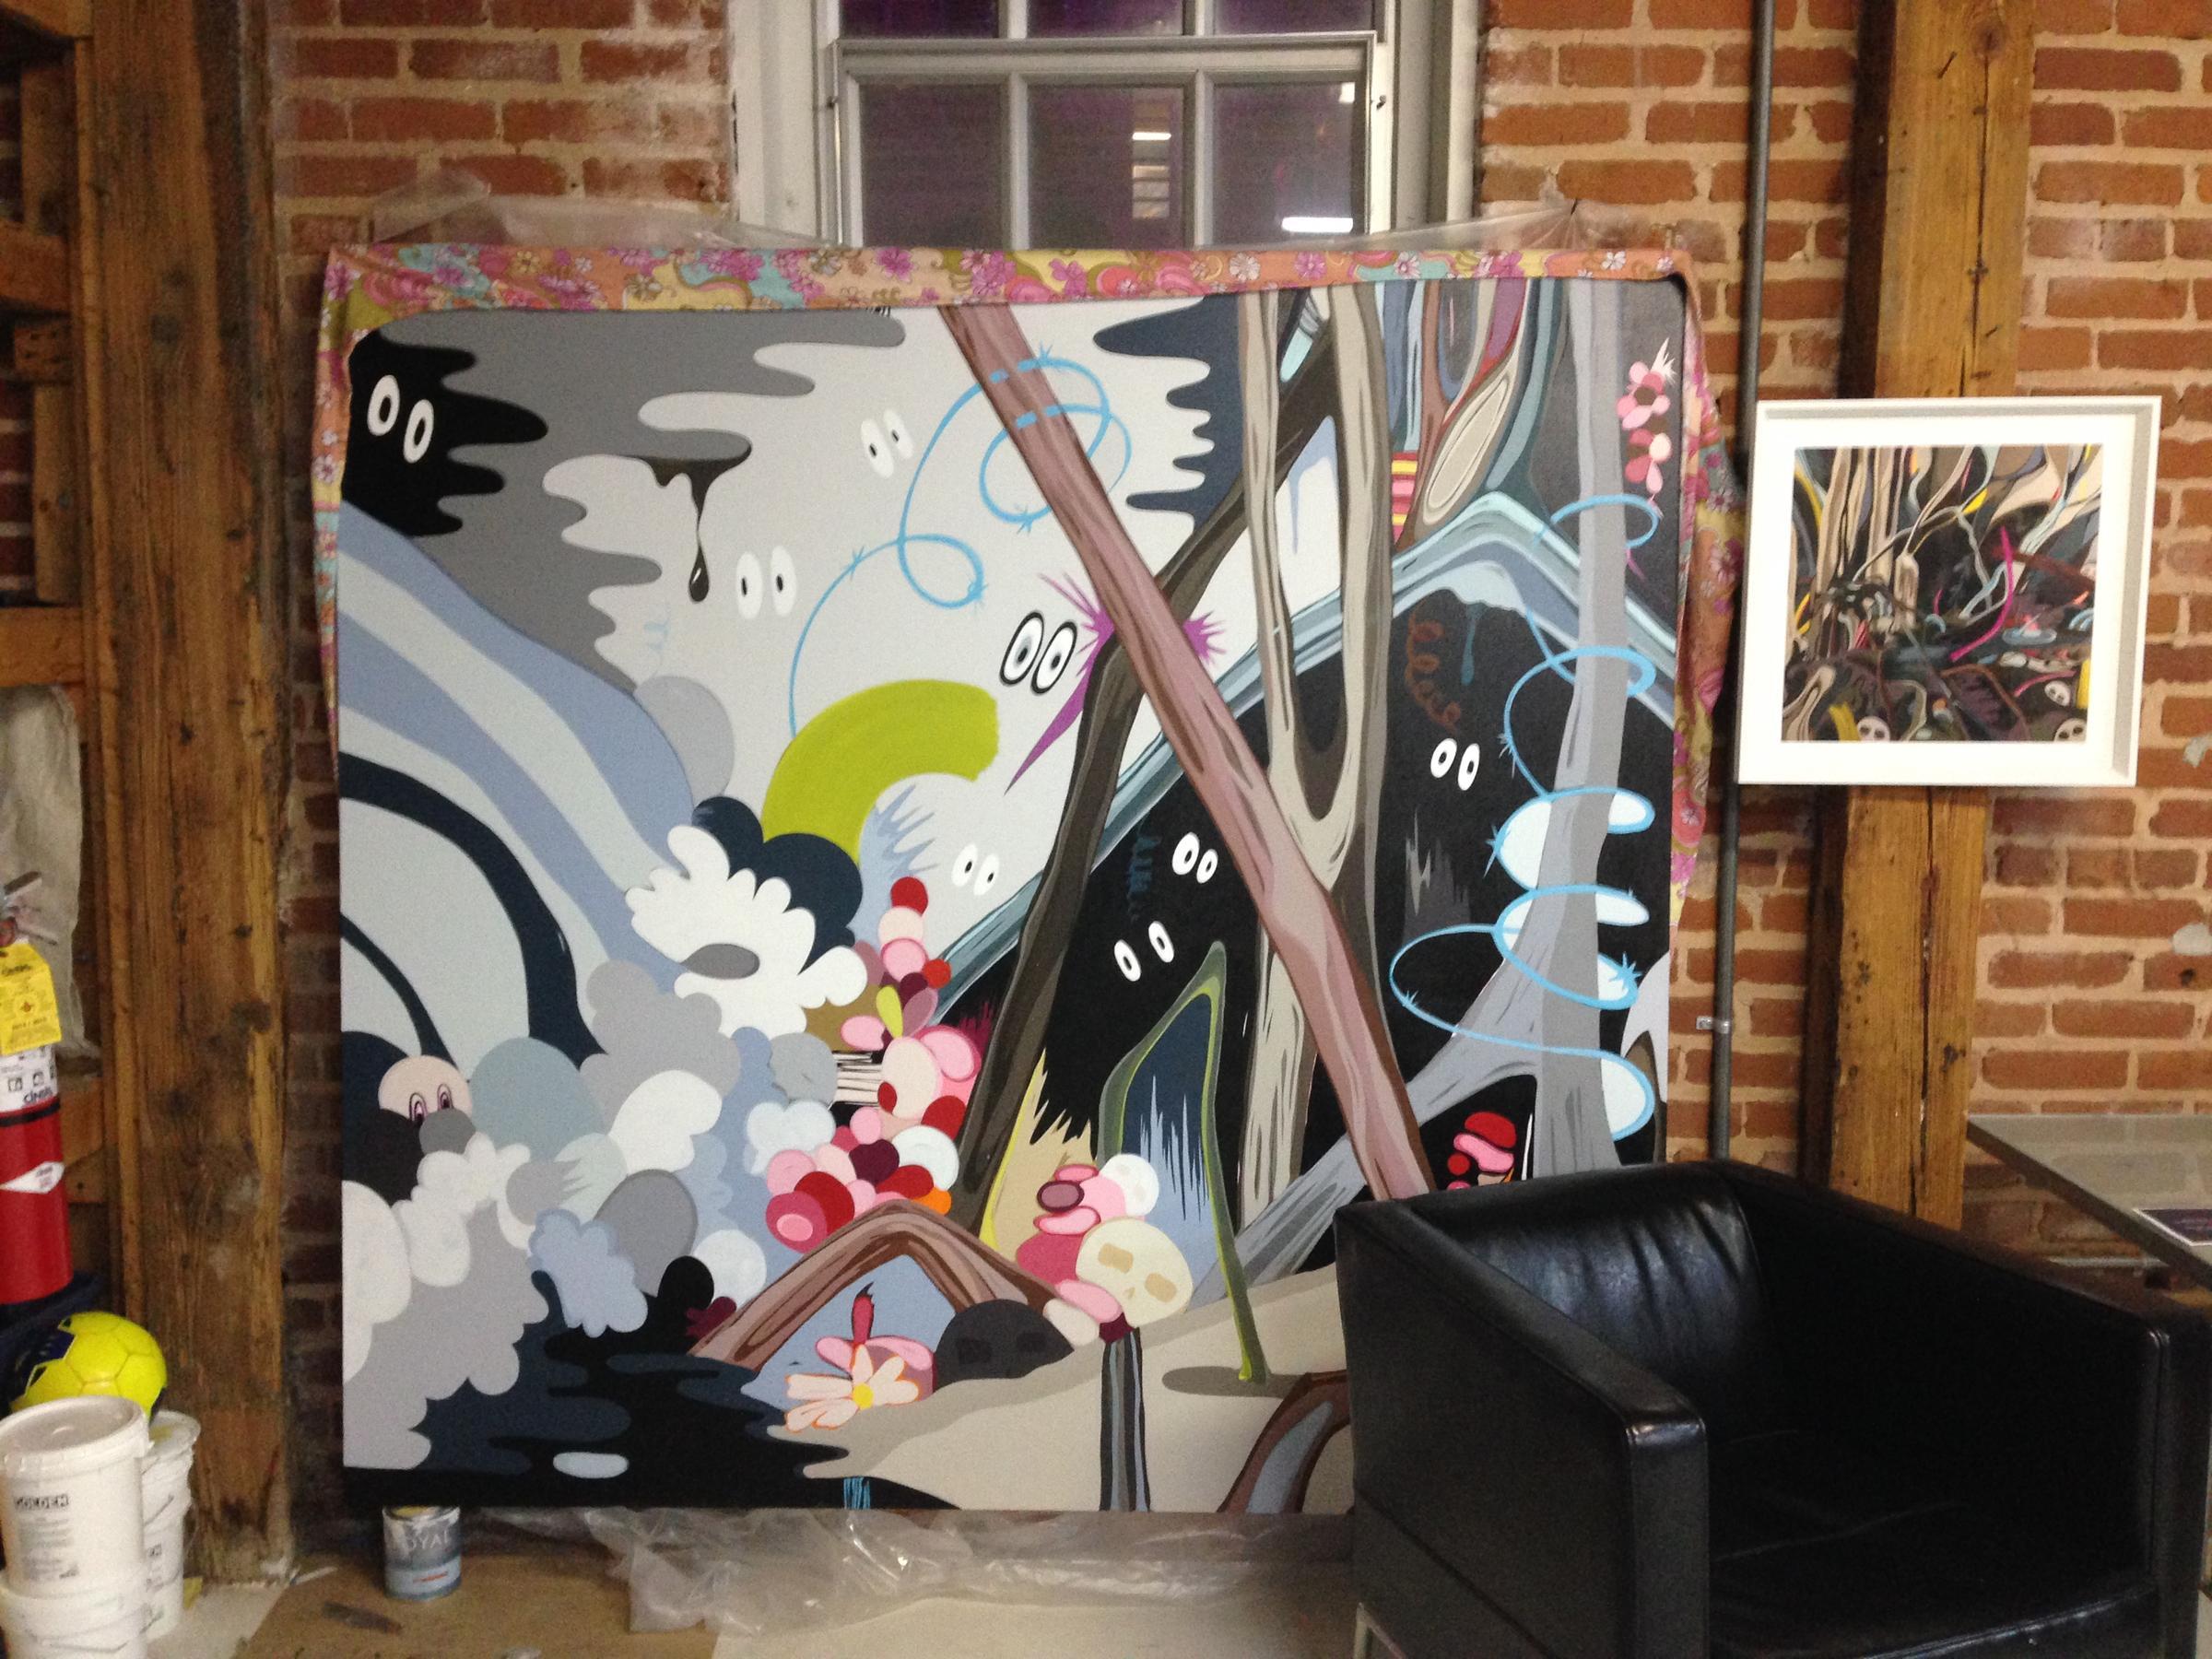 Atlanta Contemporary Art Center fering Free Admission